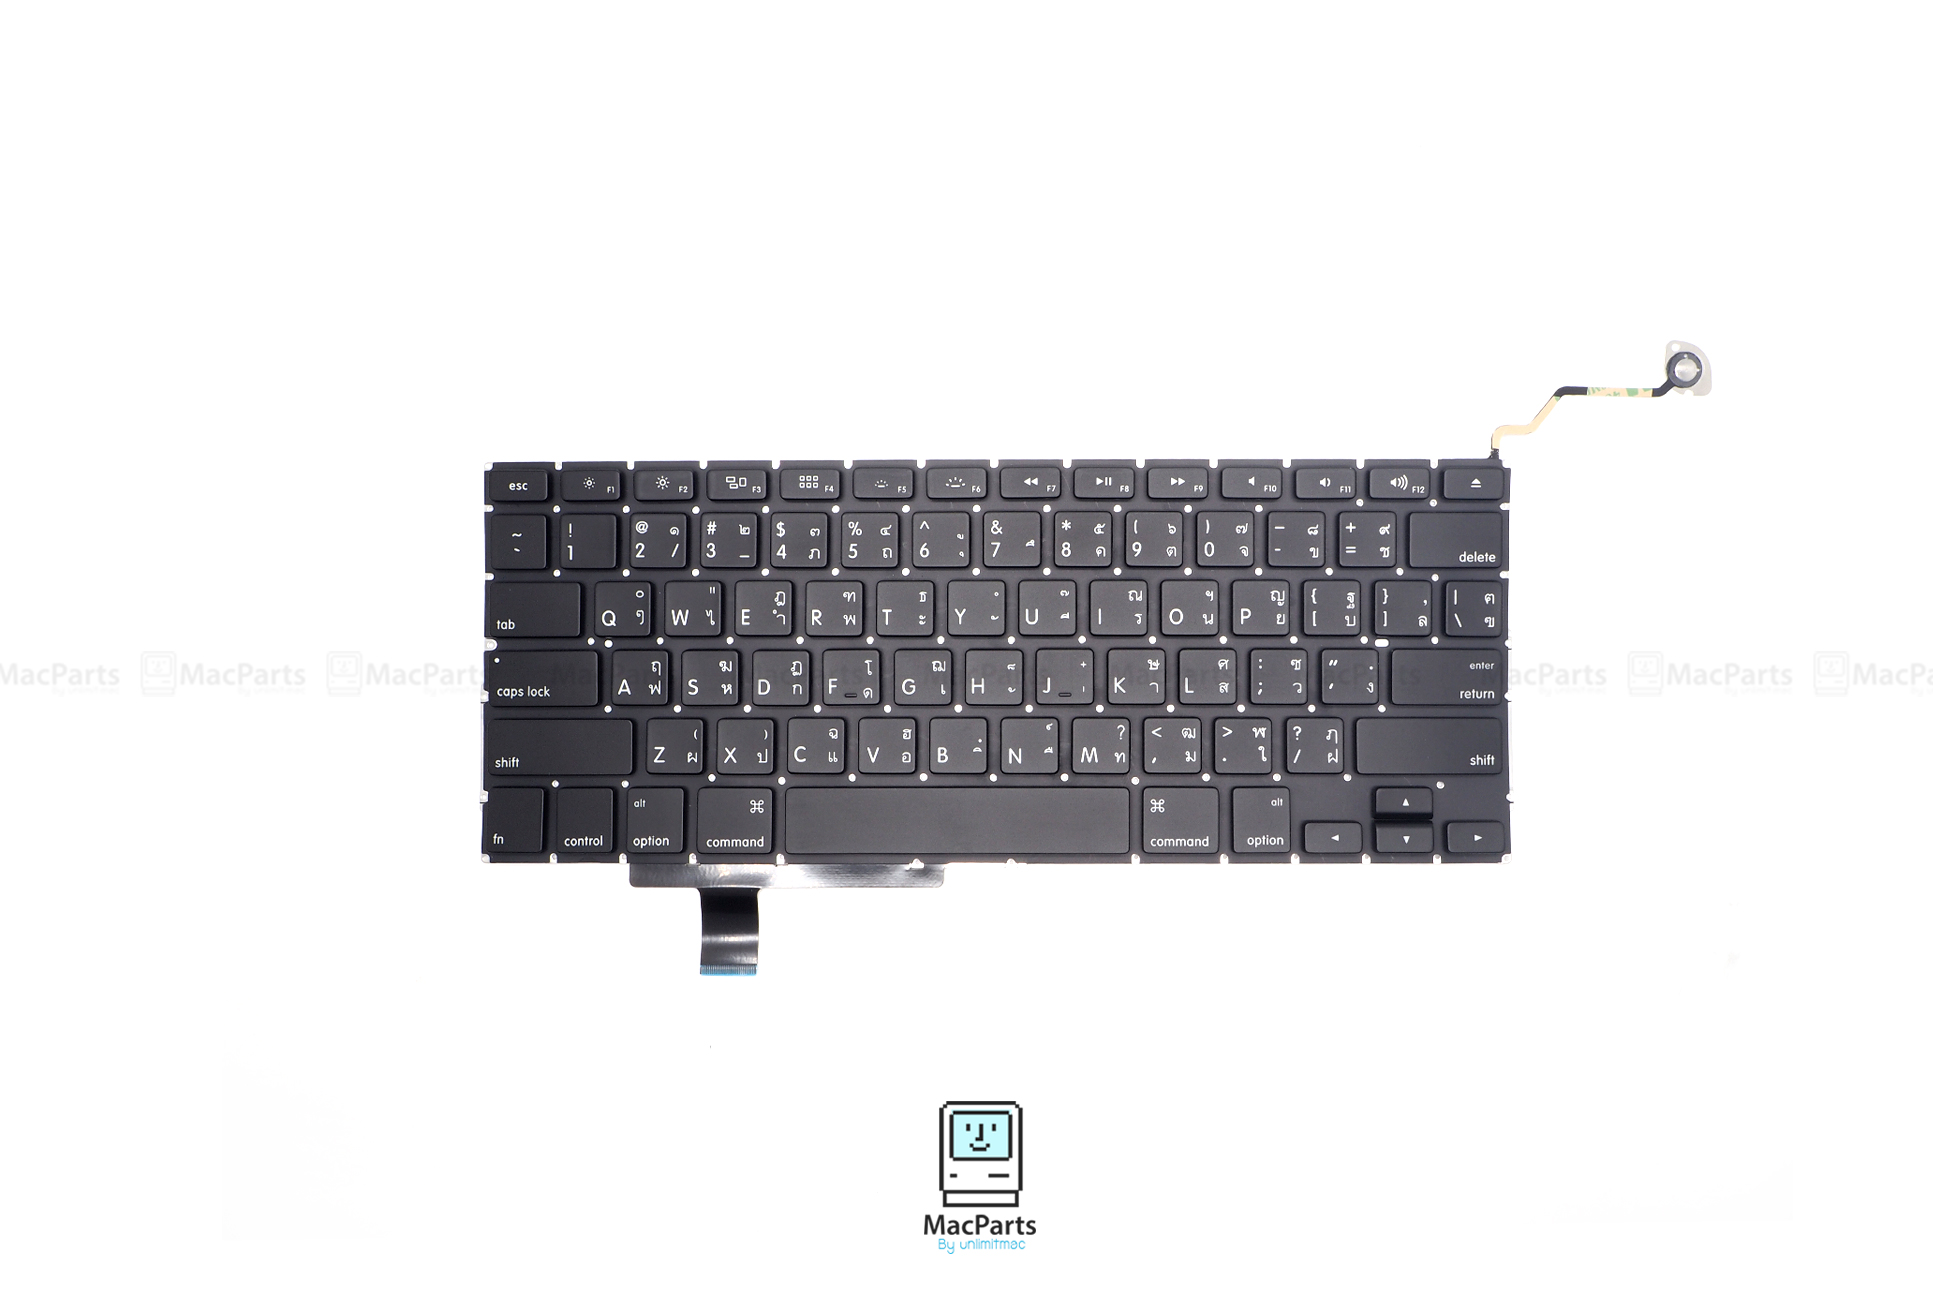 "TH/US KeyBoard MacBook Pro 17"" 2009 2010 2011 (A1297)"